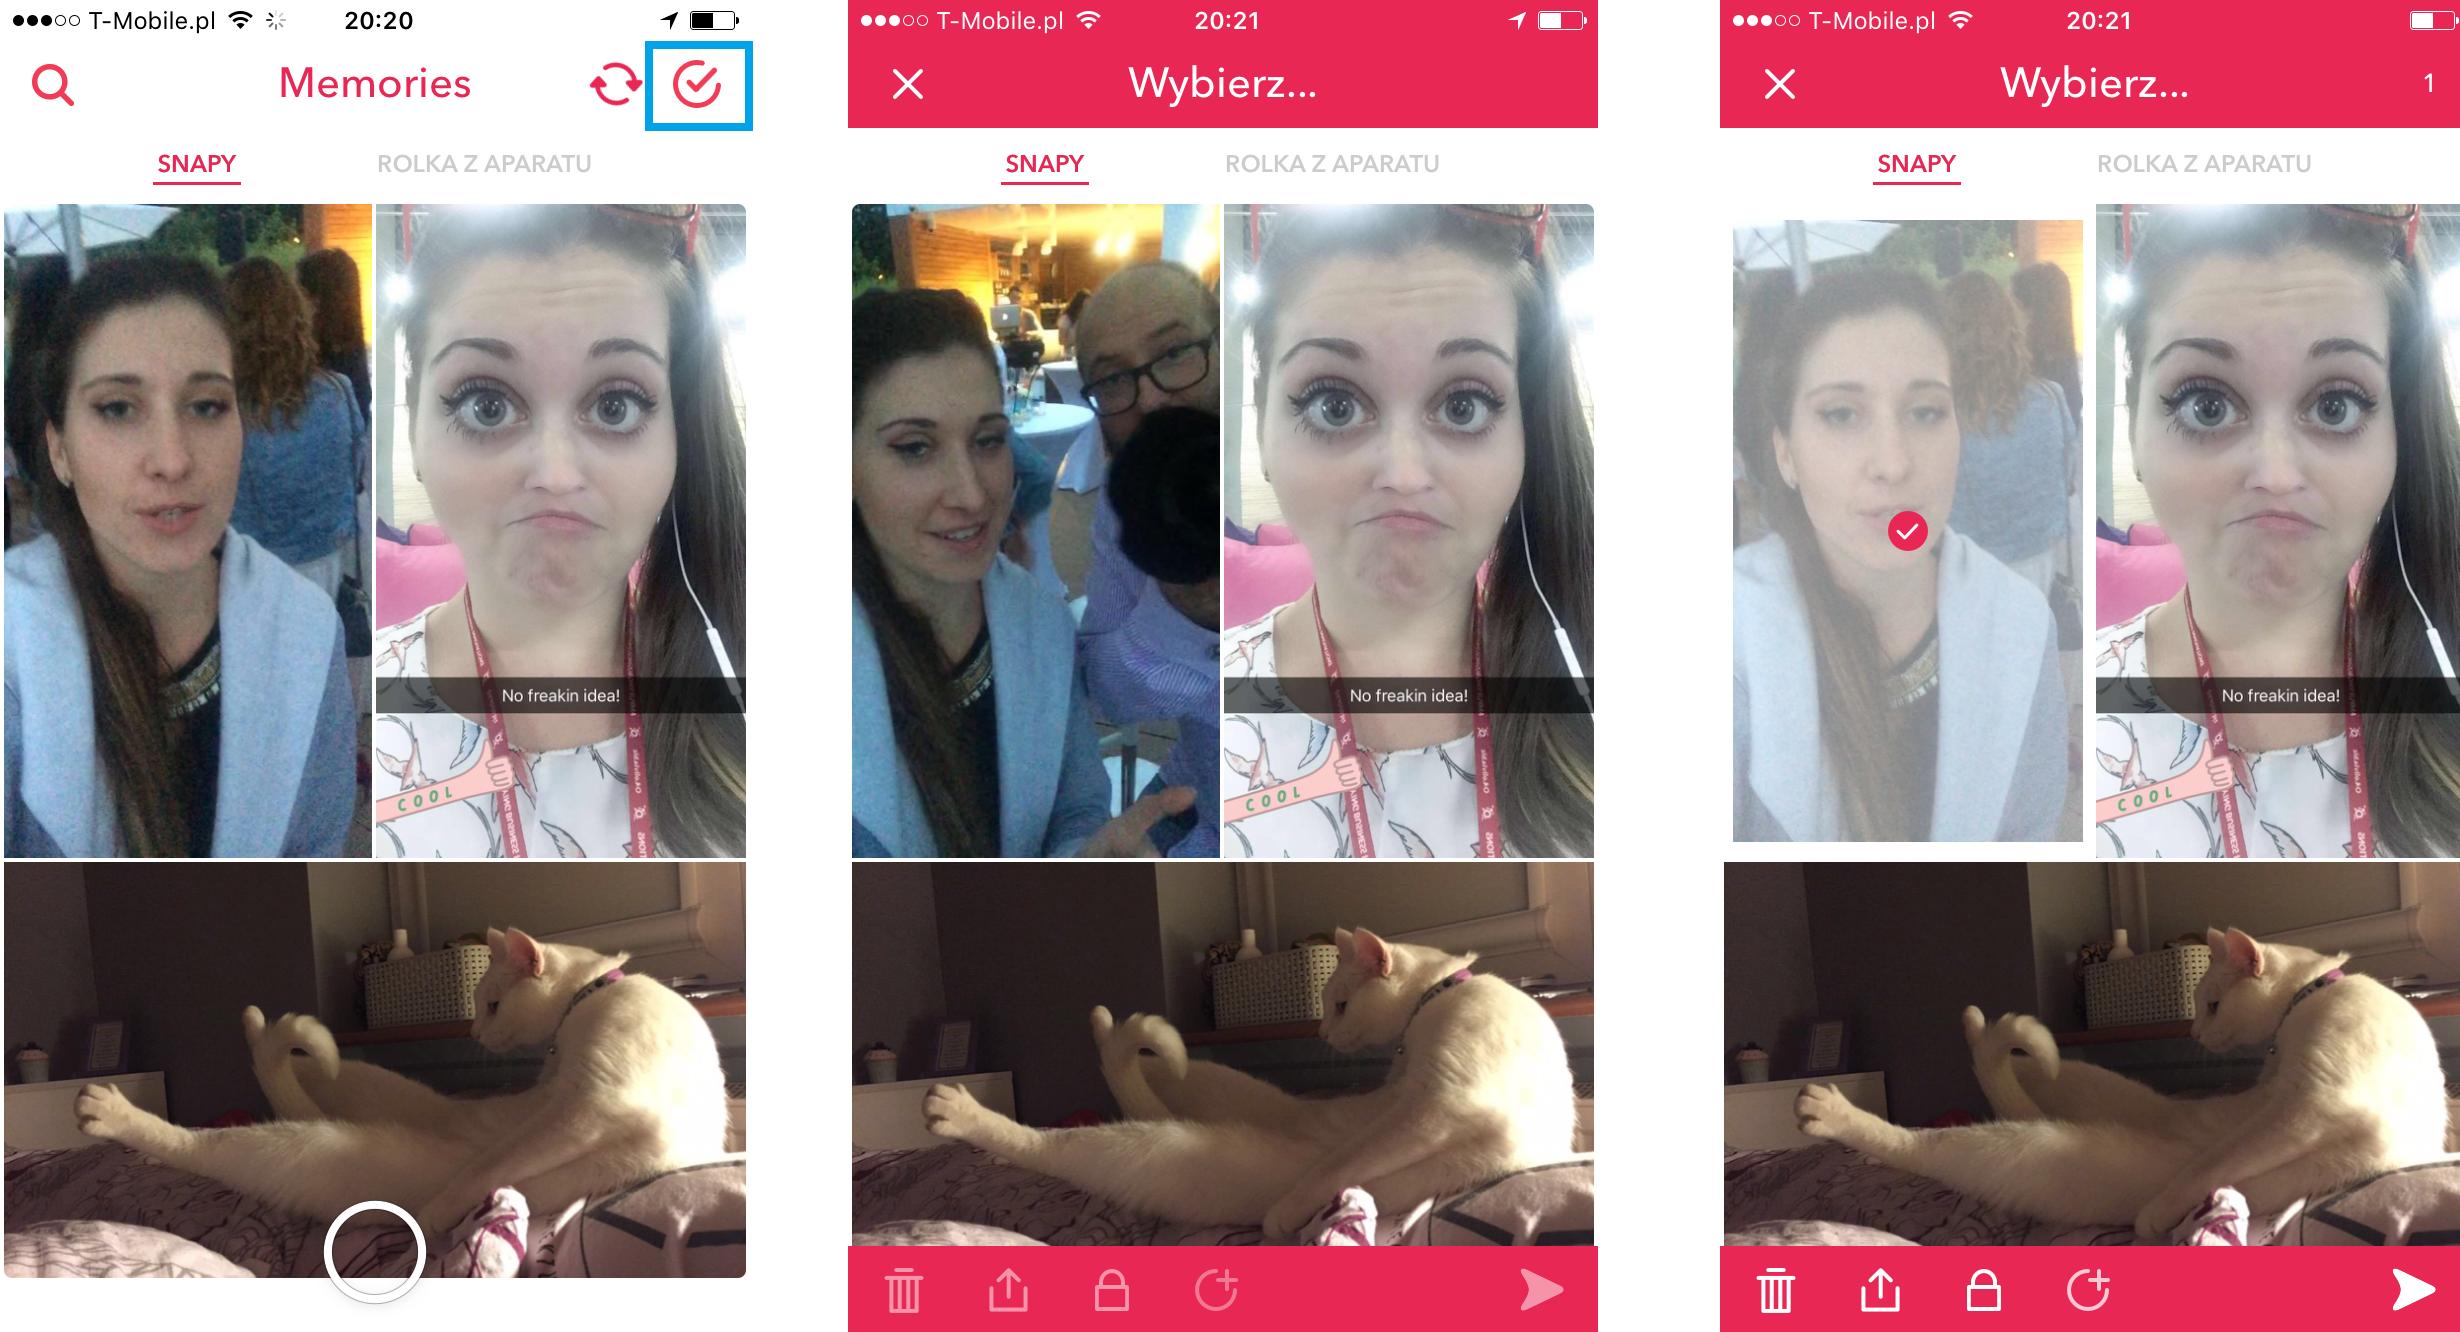 Snapchat Memories 2